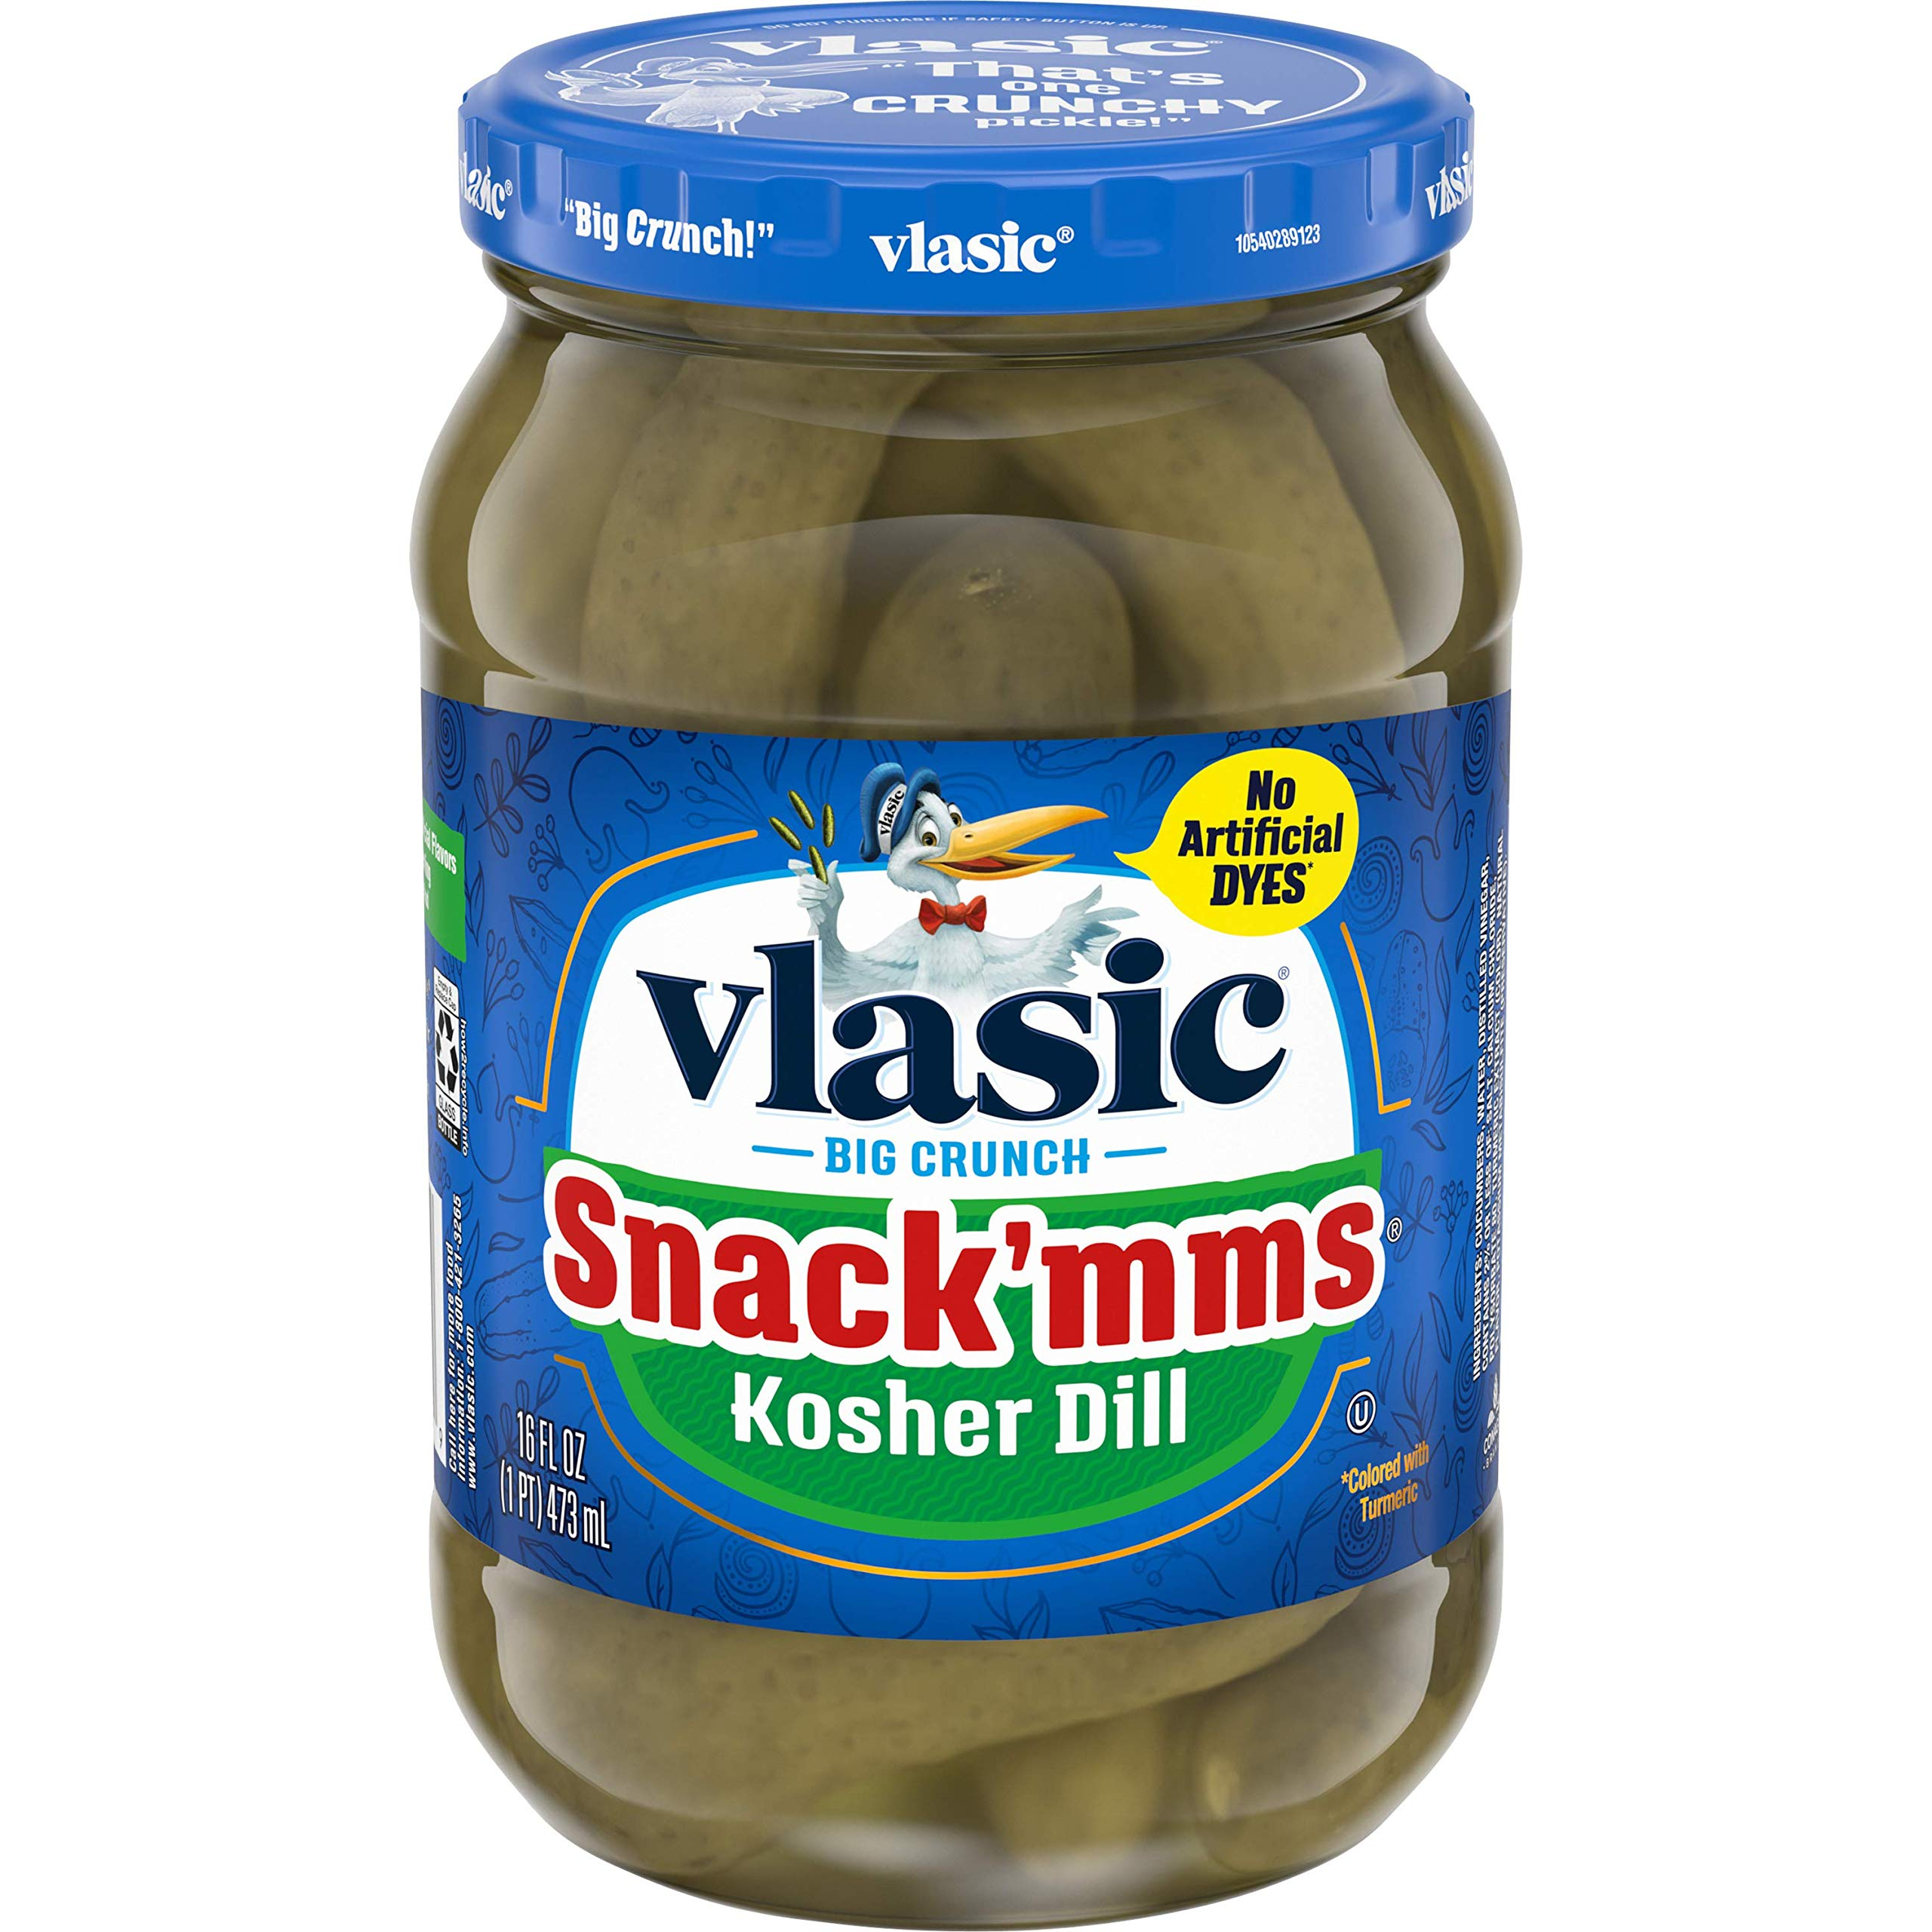 Vlasic Snack'mms Kosher Pickles Dill Minis